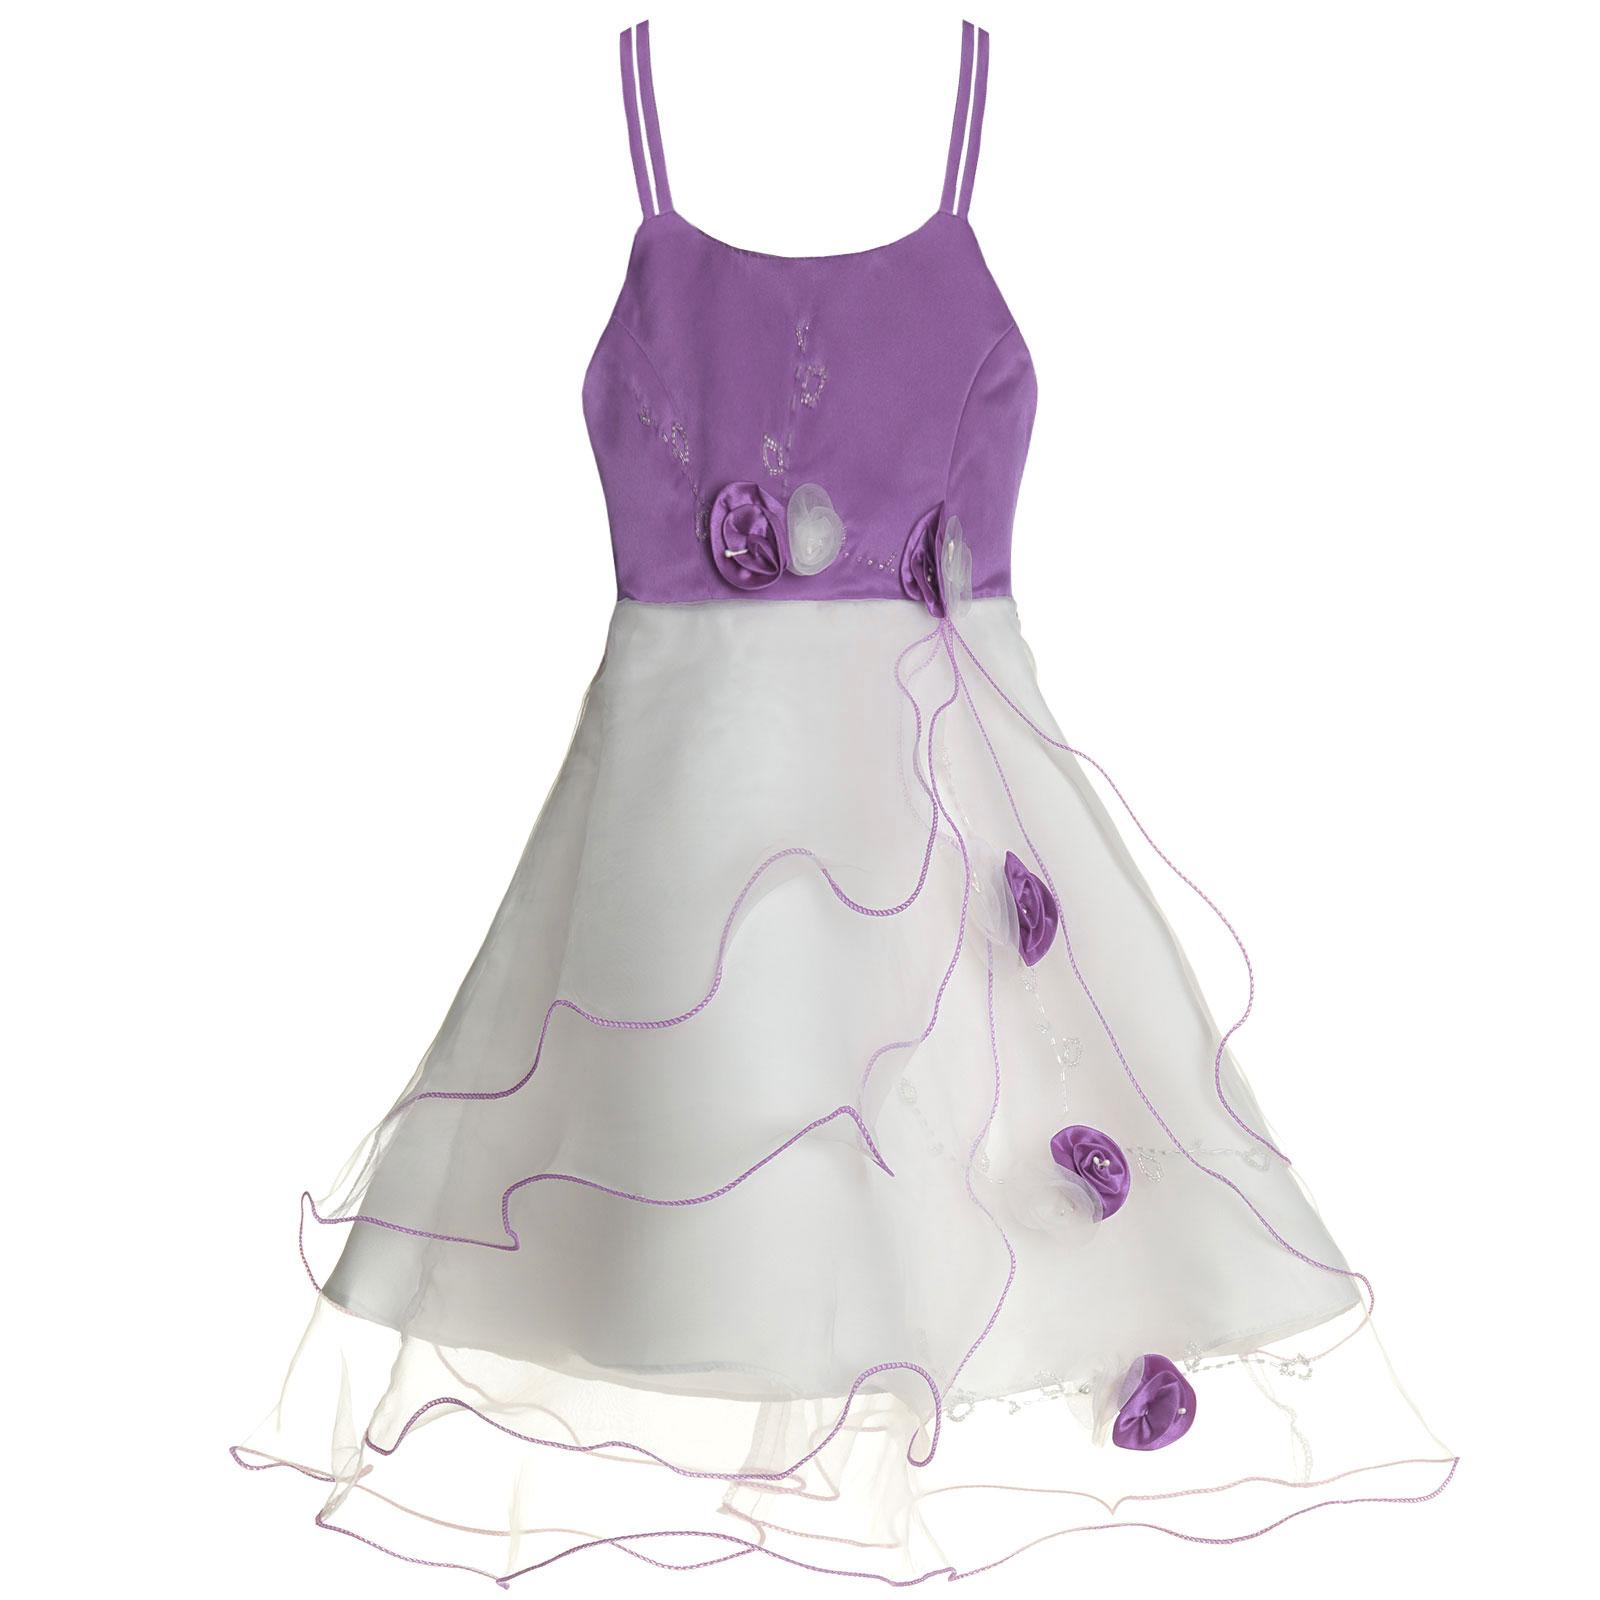 Maedchen-Kinder-Kleid-Peticoat-Festkleid-Lang-Arm-Kostuem-mit-Bolero-Rose-21476 Indexbild 8